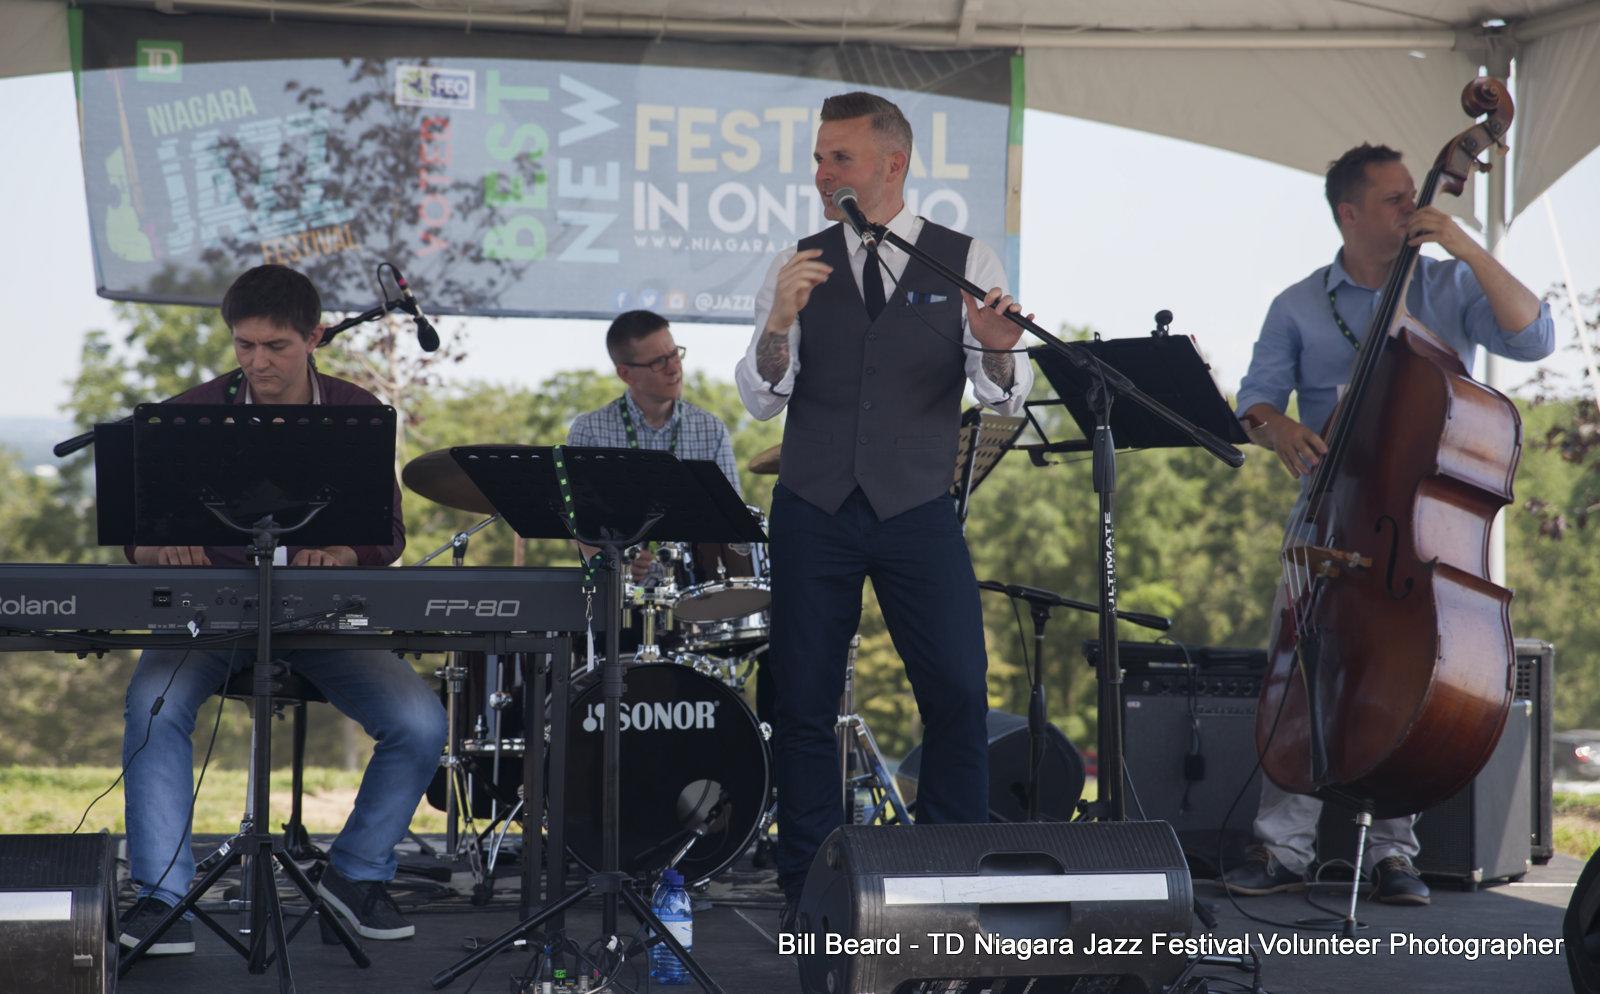 JAZZ on the RISE - Canada 150 Celebration - Megalomaniac Winery - Stu Mac Quartet (Vocals) Sunday, July 30th, 2017. Photo: Bill Beard